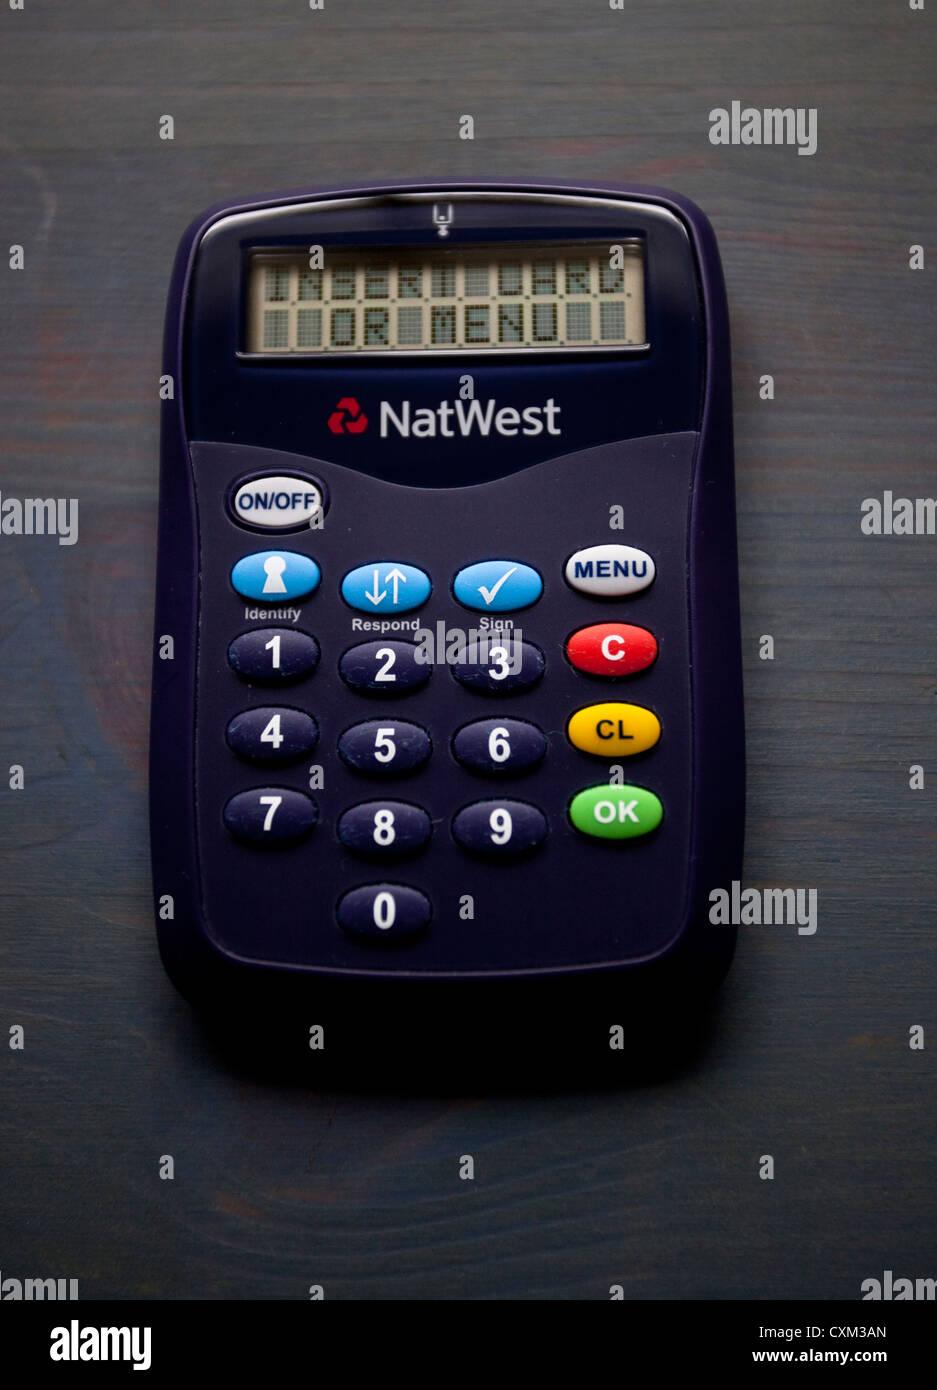 Natwest Card Stock Photos & Natwest Card Stock Images - Alamy